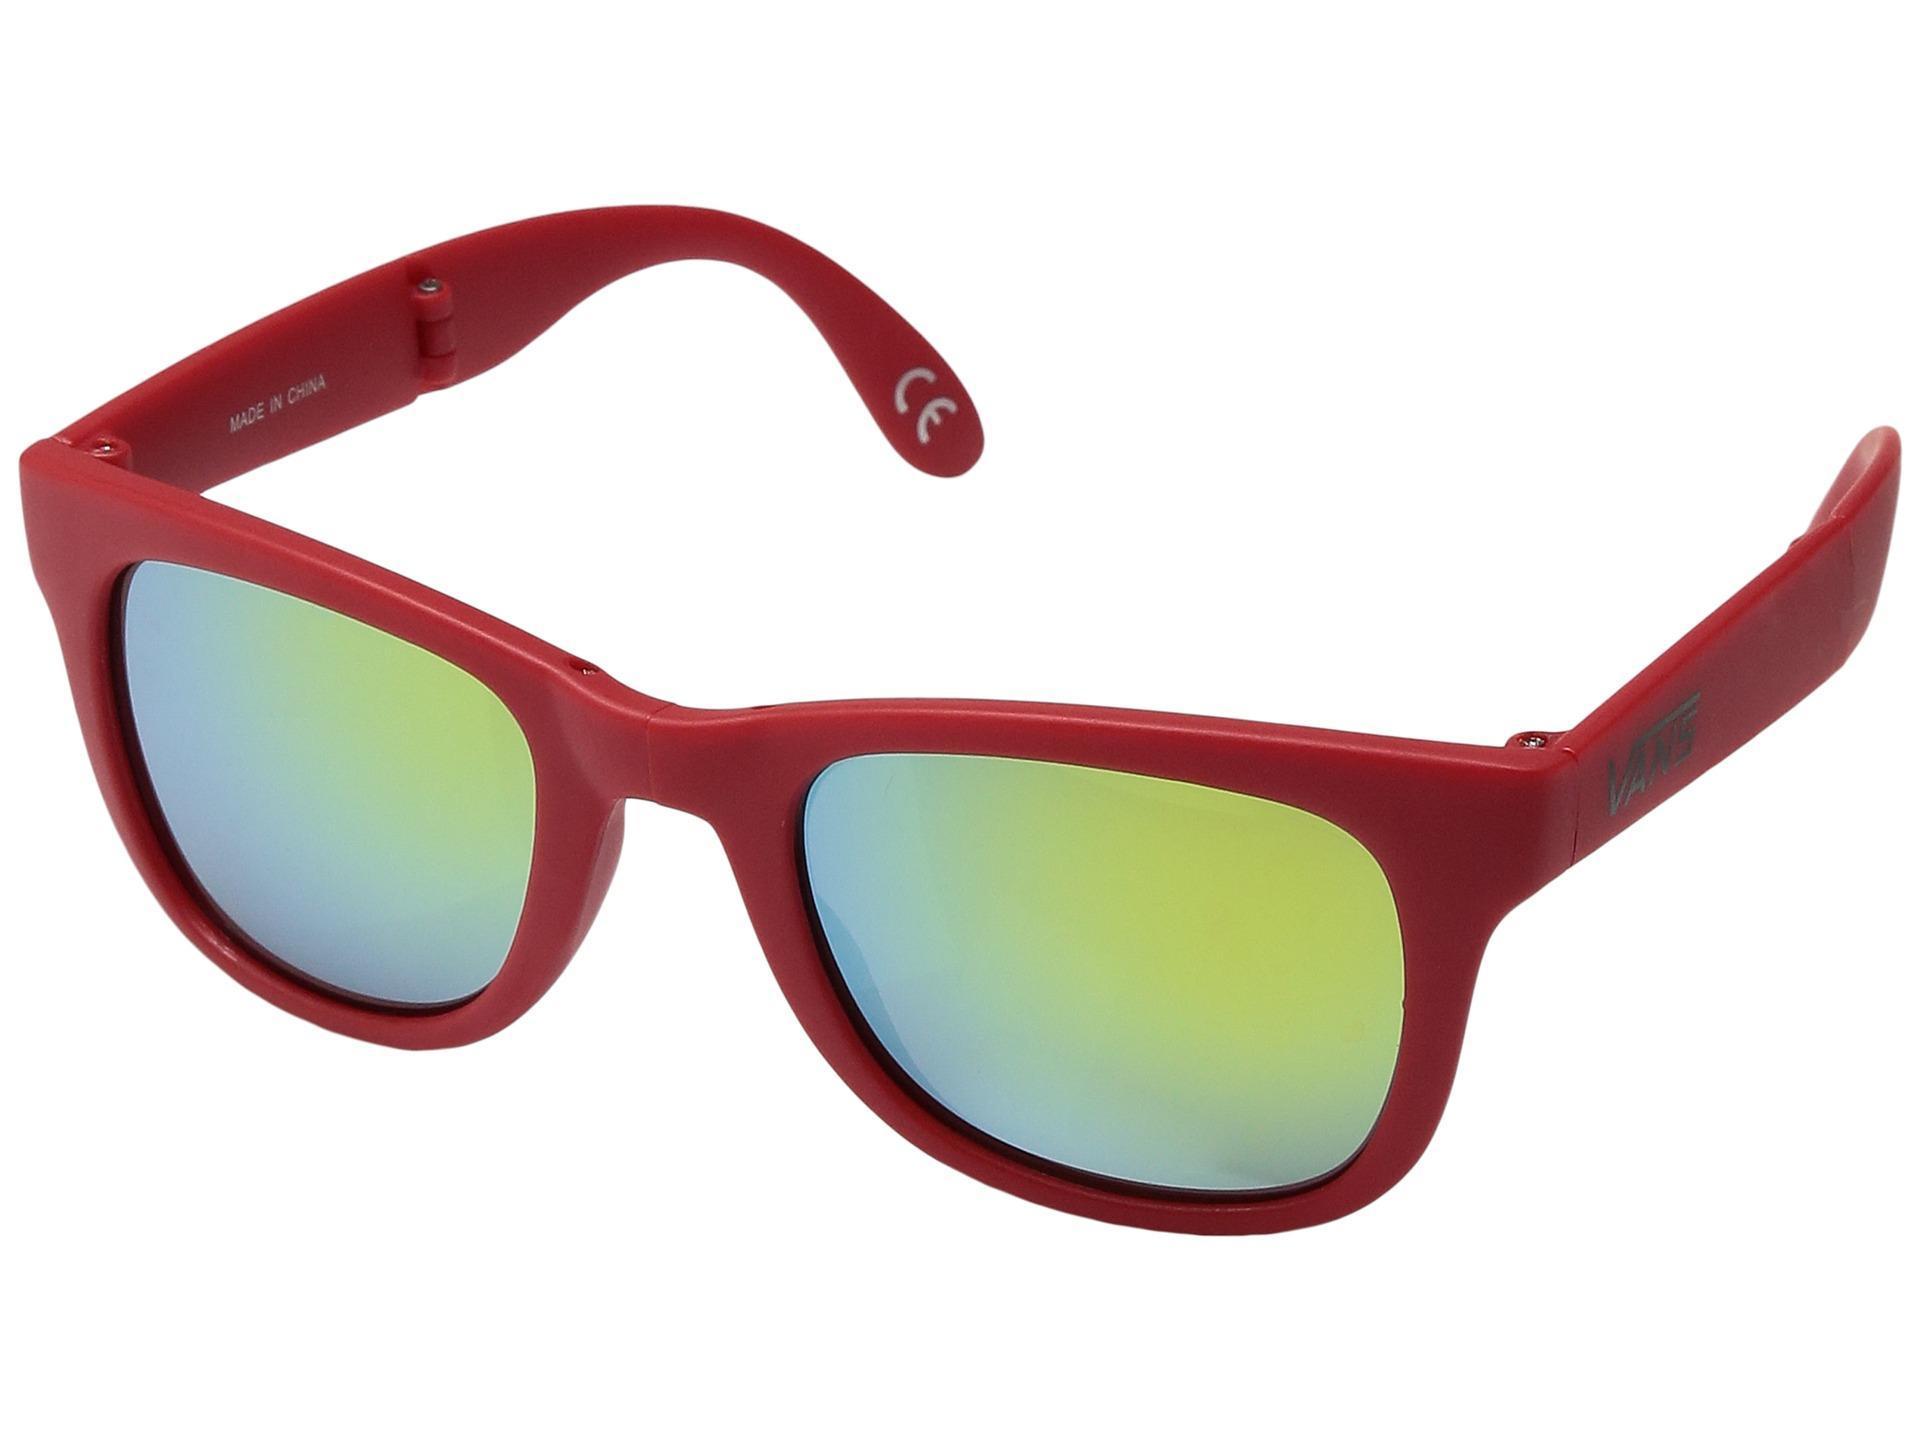 Vans Herren Sonnenbrille Foldable Spicoli Racing Red 9vaTX6Fw